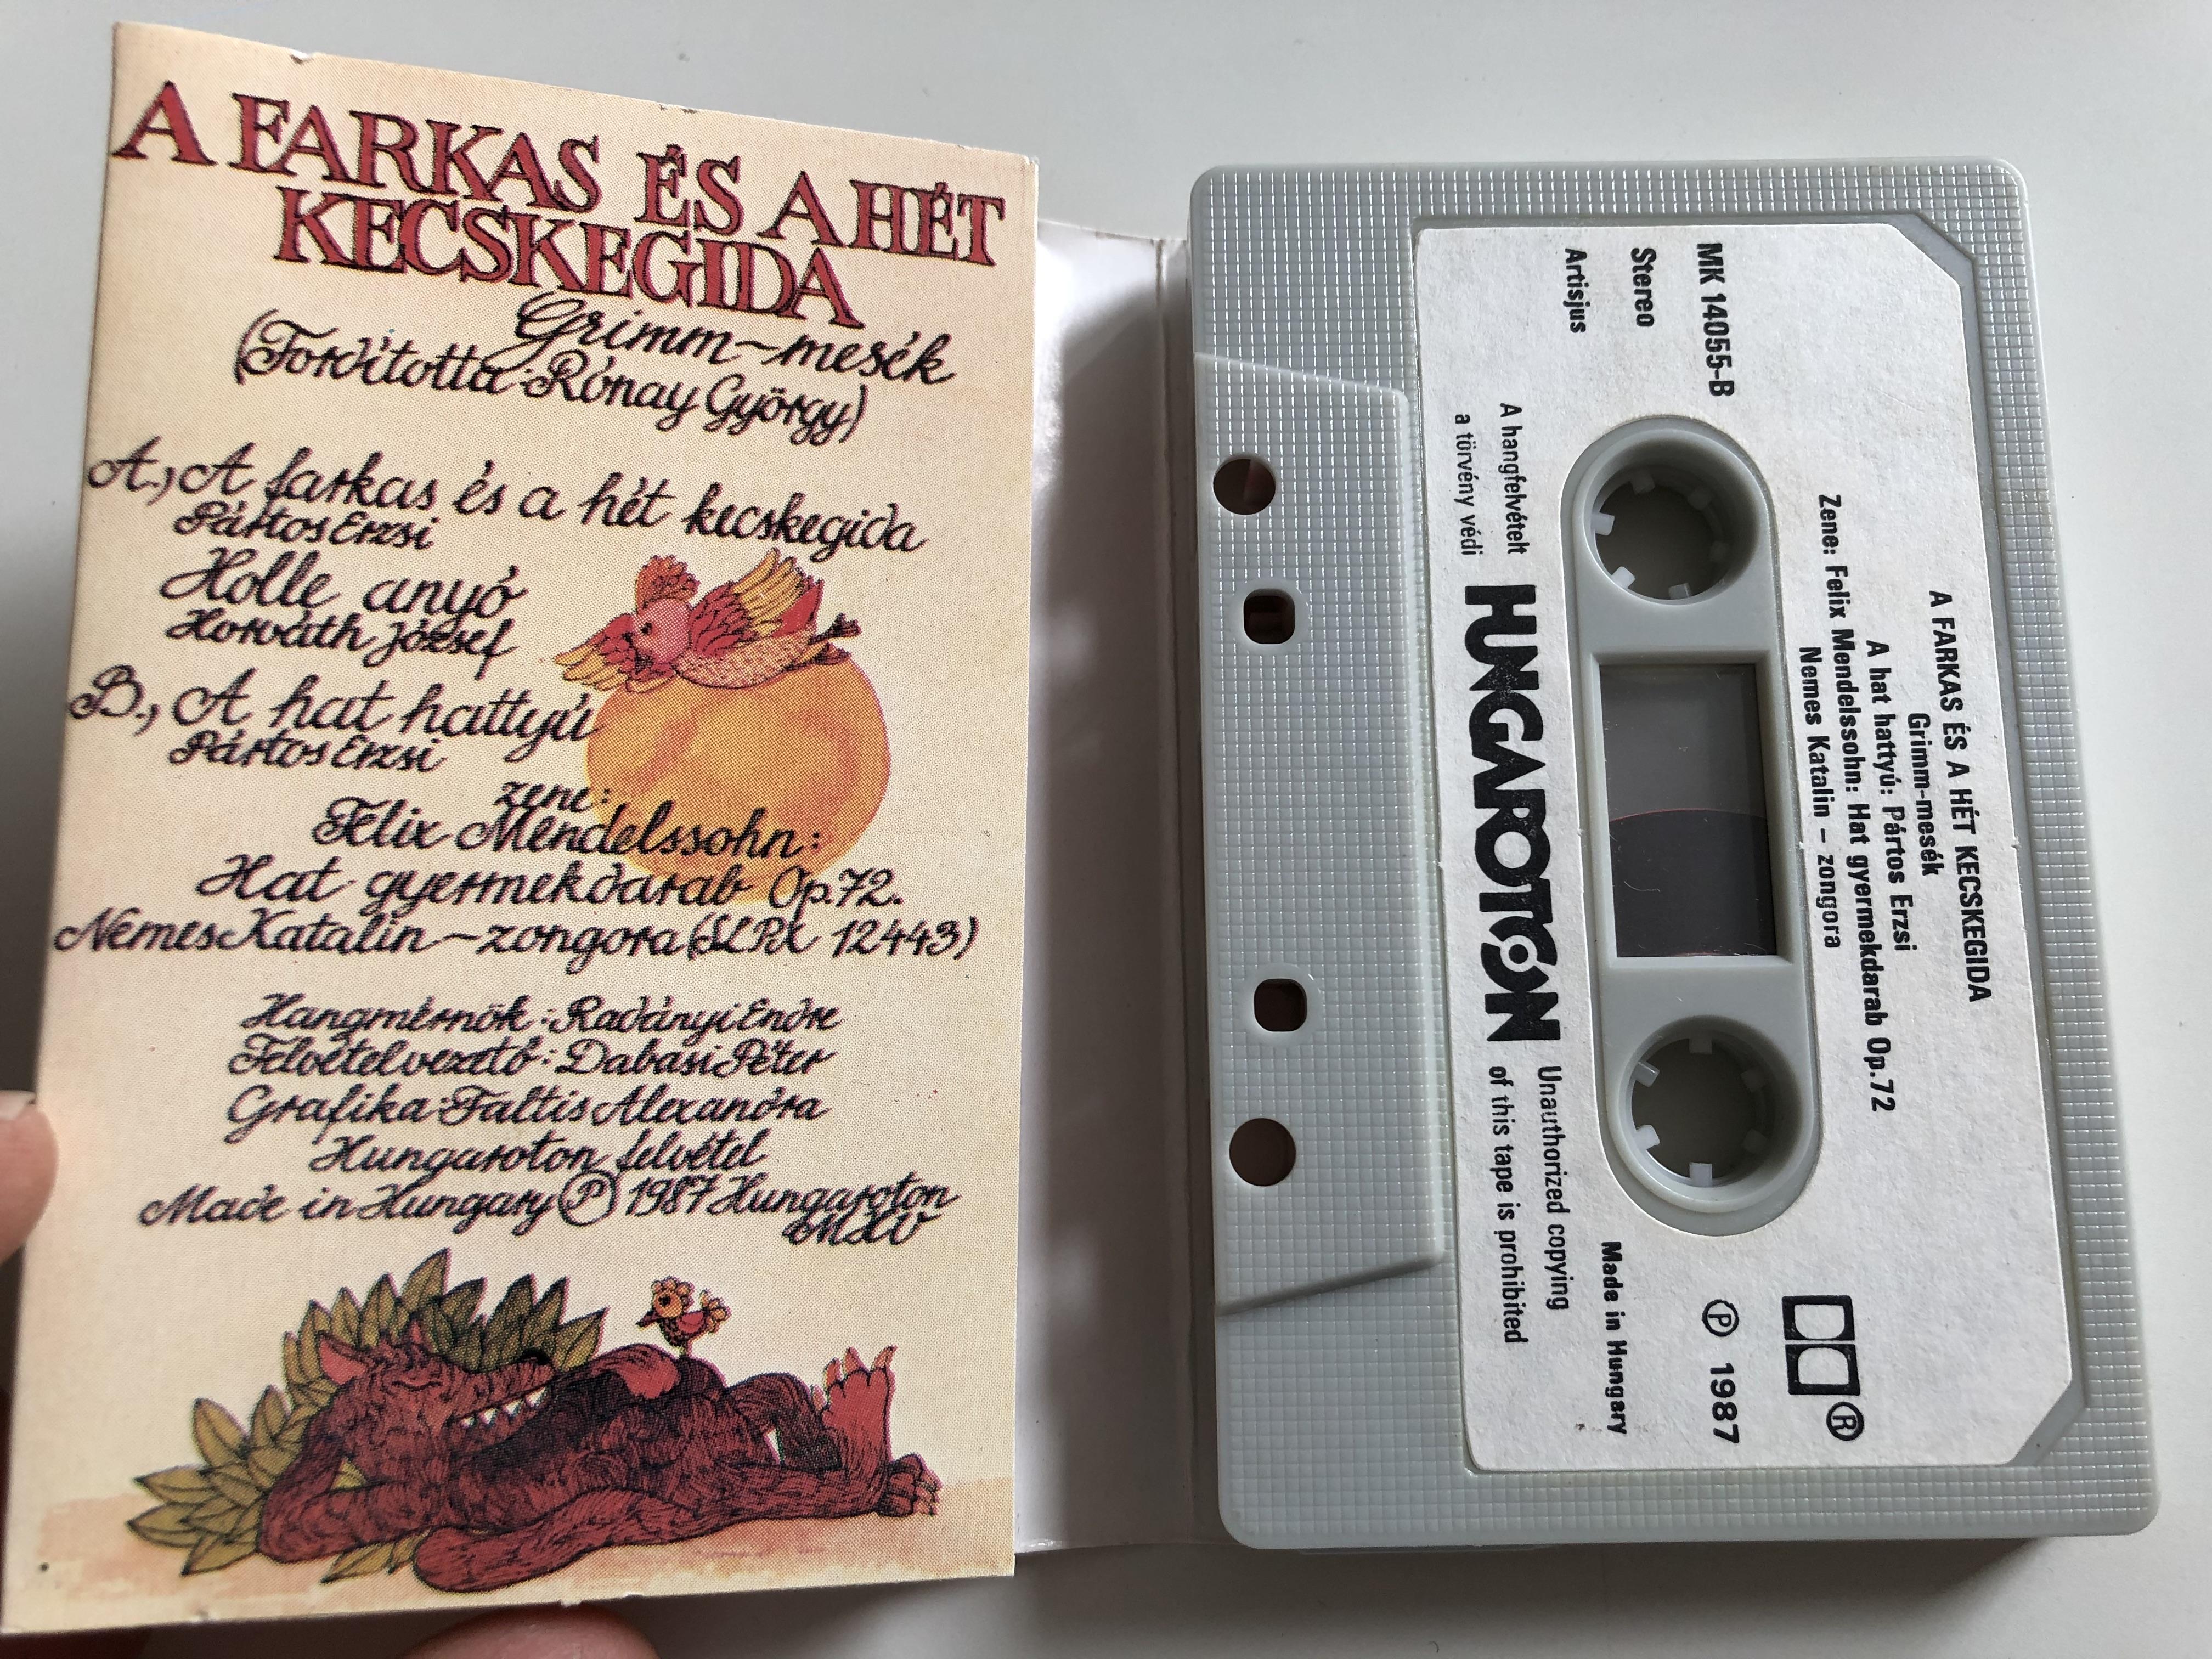 a-farkas-s-a-h-t-kecskegida-grimm-mes-k-p-rtos-erzsi-horv-th-j-zsef-hungaroton-cassette-stereo-mk-14055-2-.jpg